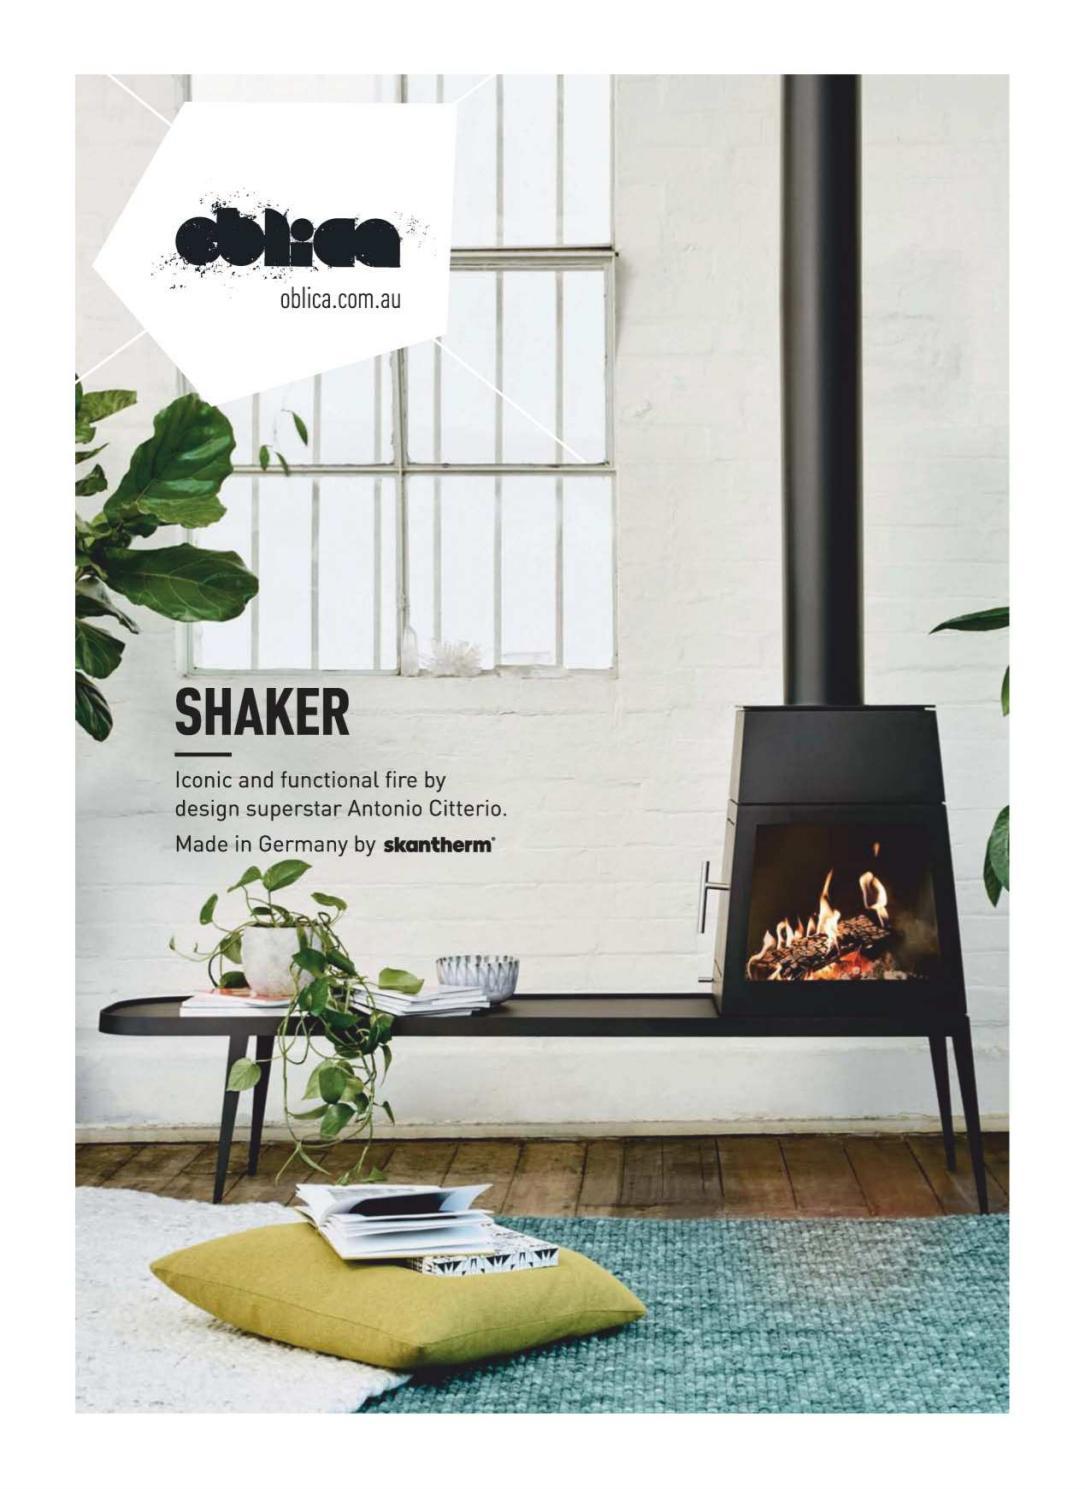 Shaker Fireplace Best Of Ddddlflfoflfxx by Elloco666 issuu